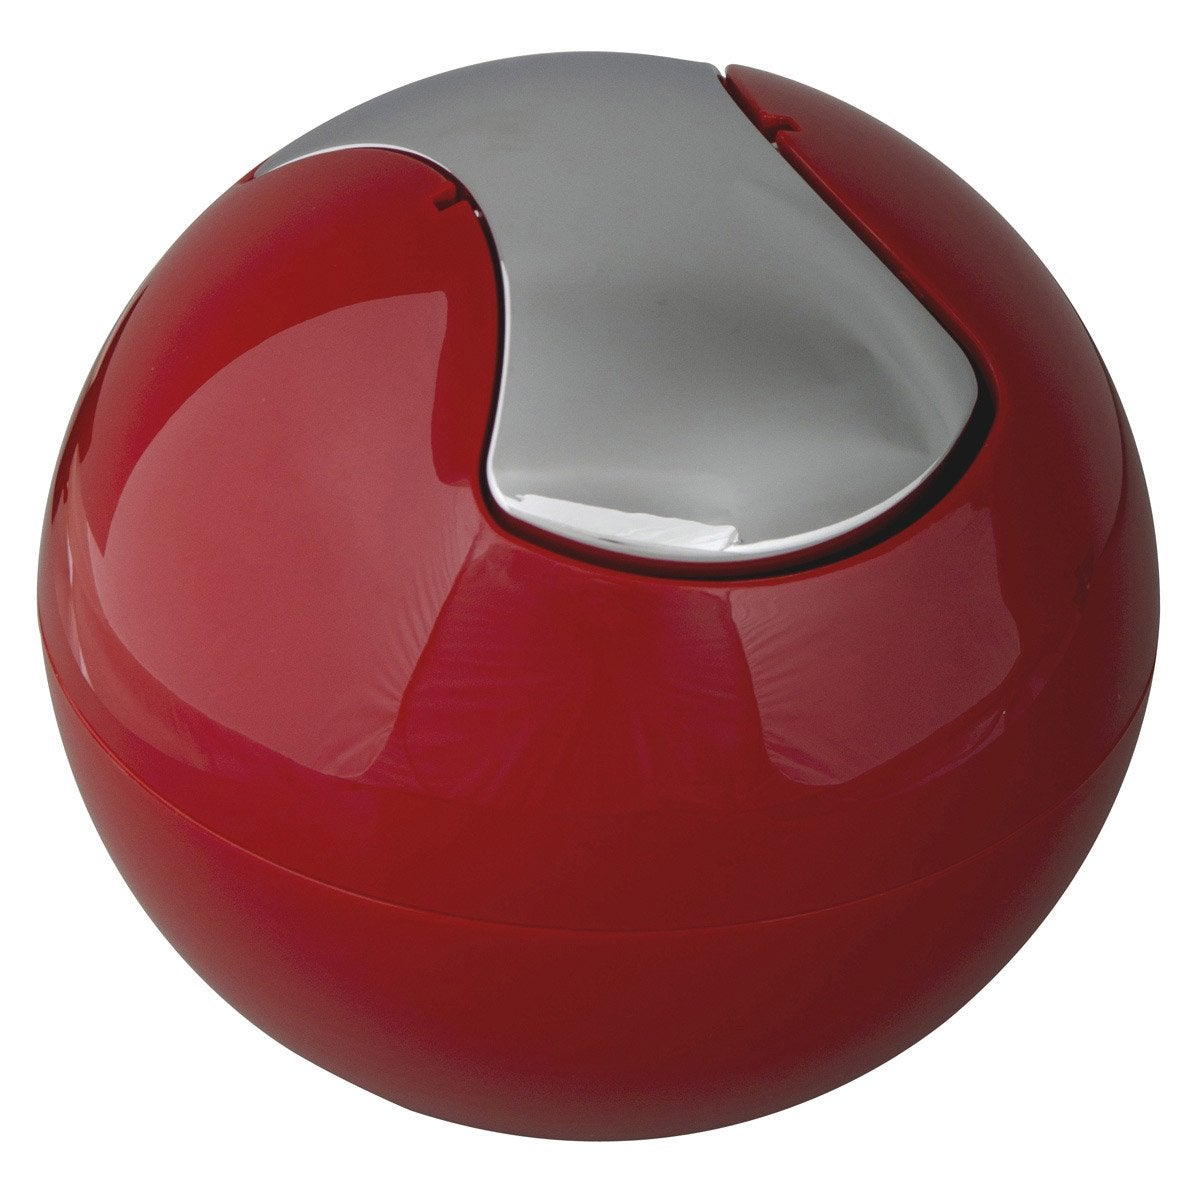 Salle de bain rouge leroy merlin salle de bain leroy for Poubelle salle de bain leroy merlin